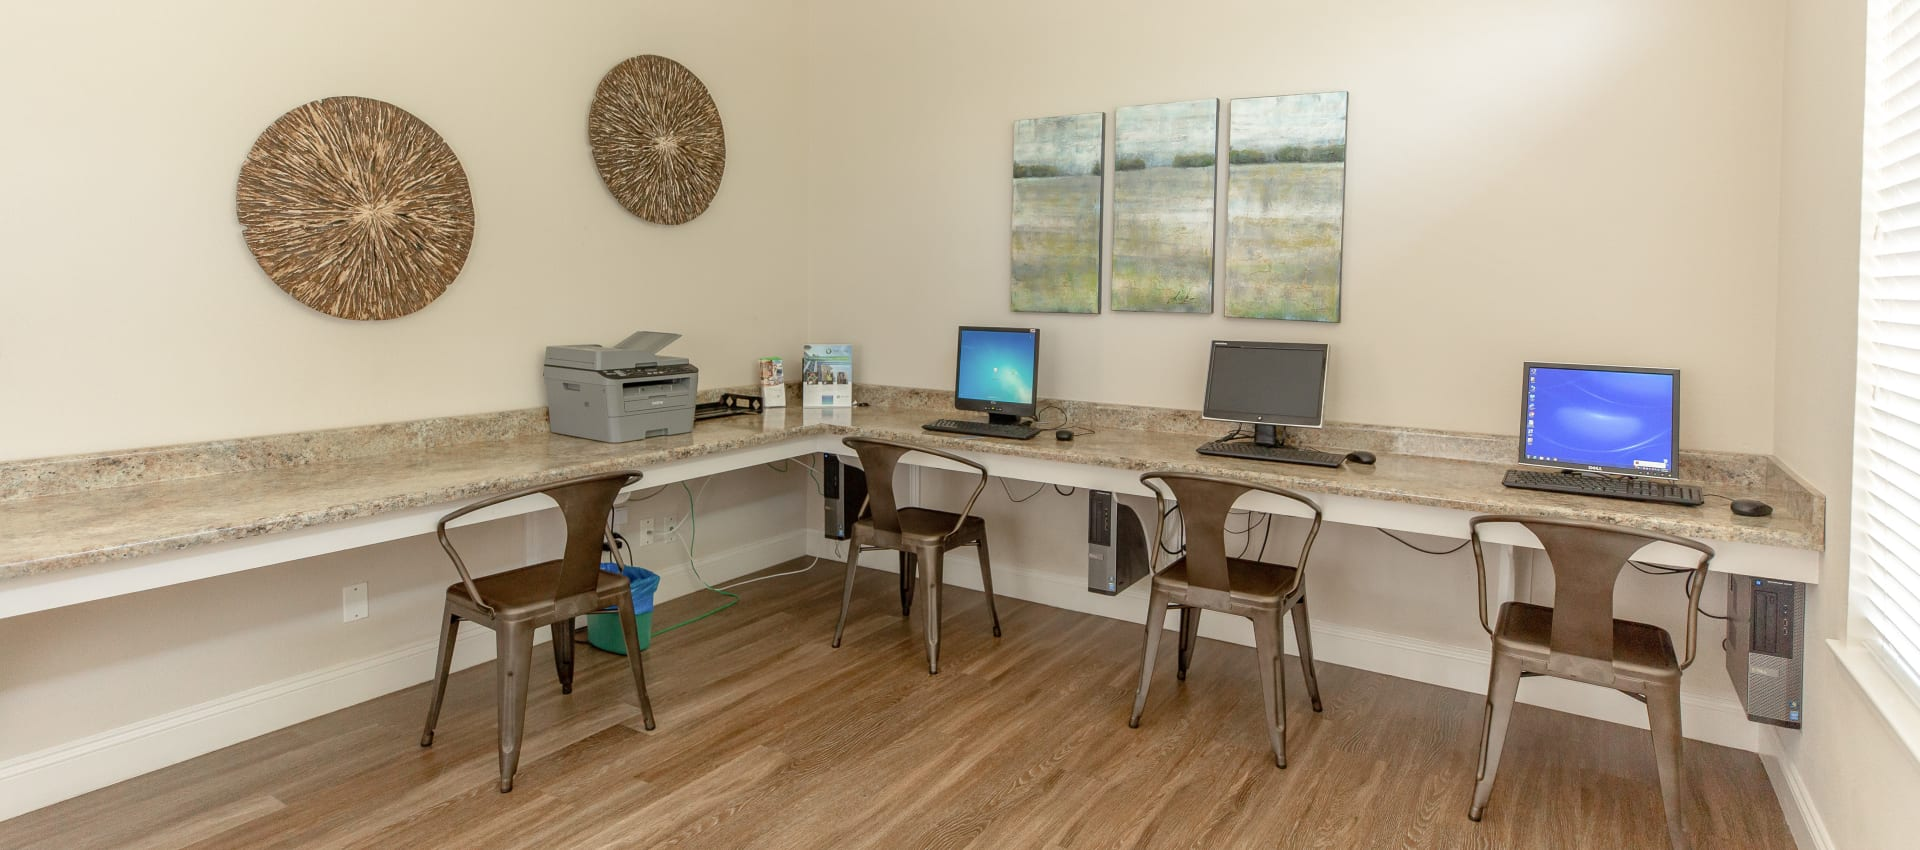 Business center at Shaliko in Rocklin, California.